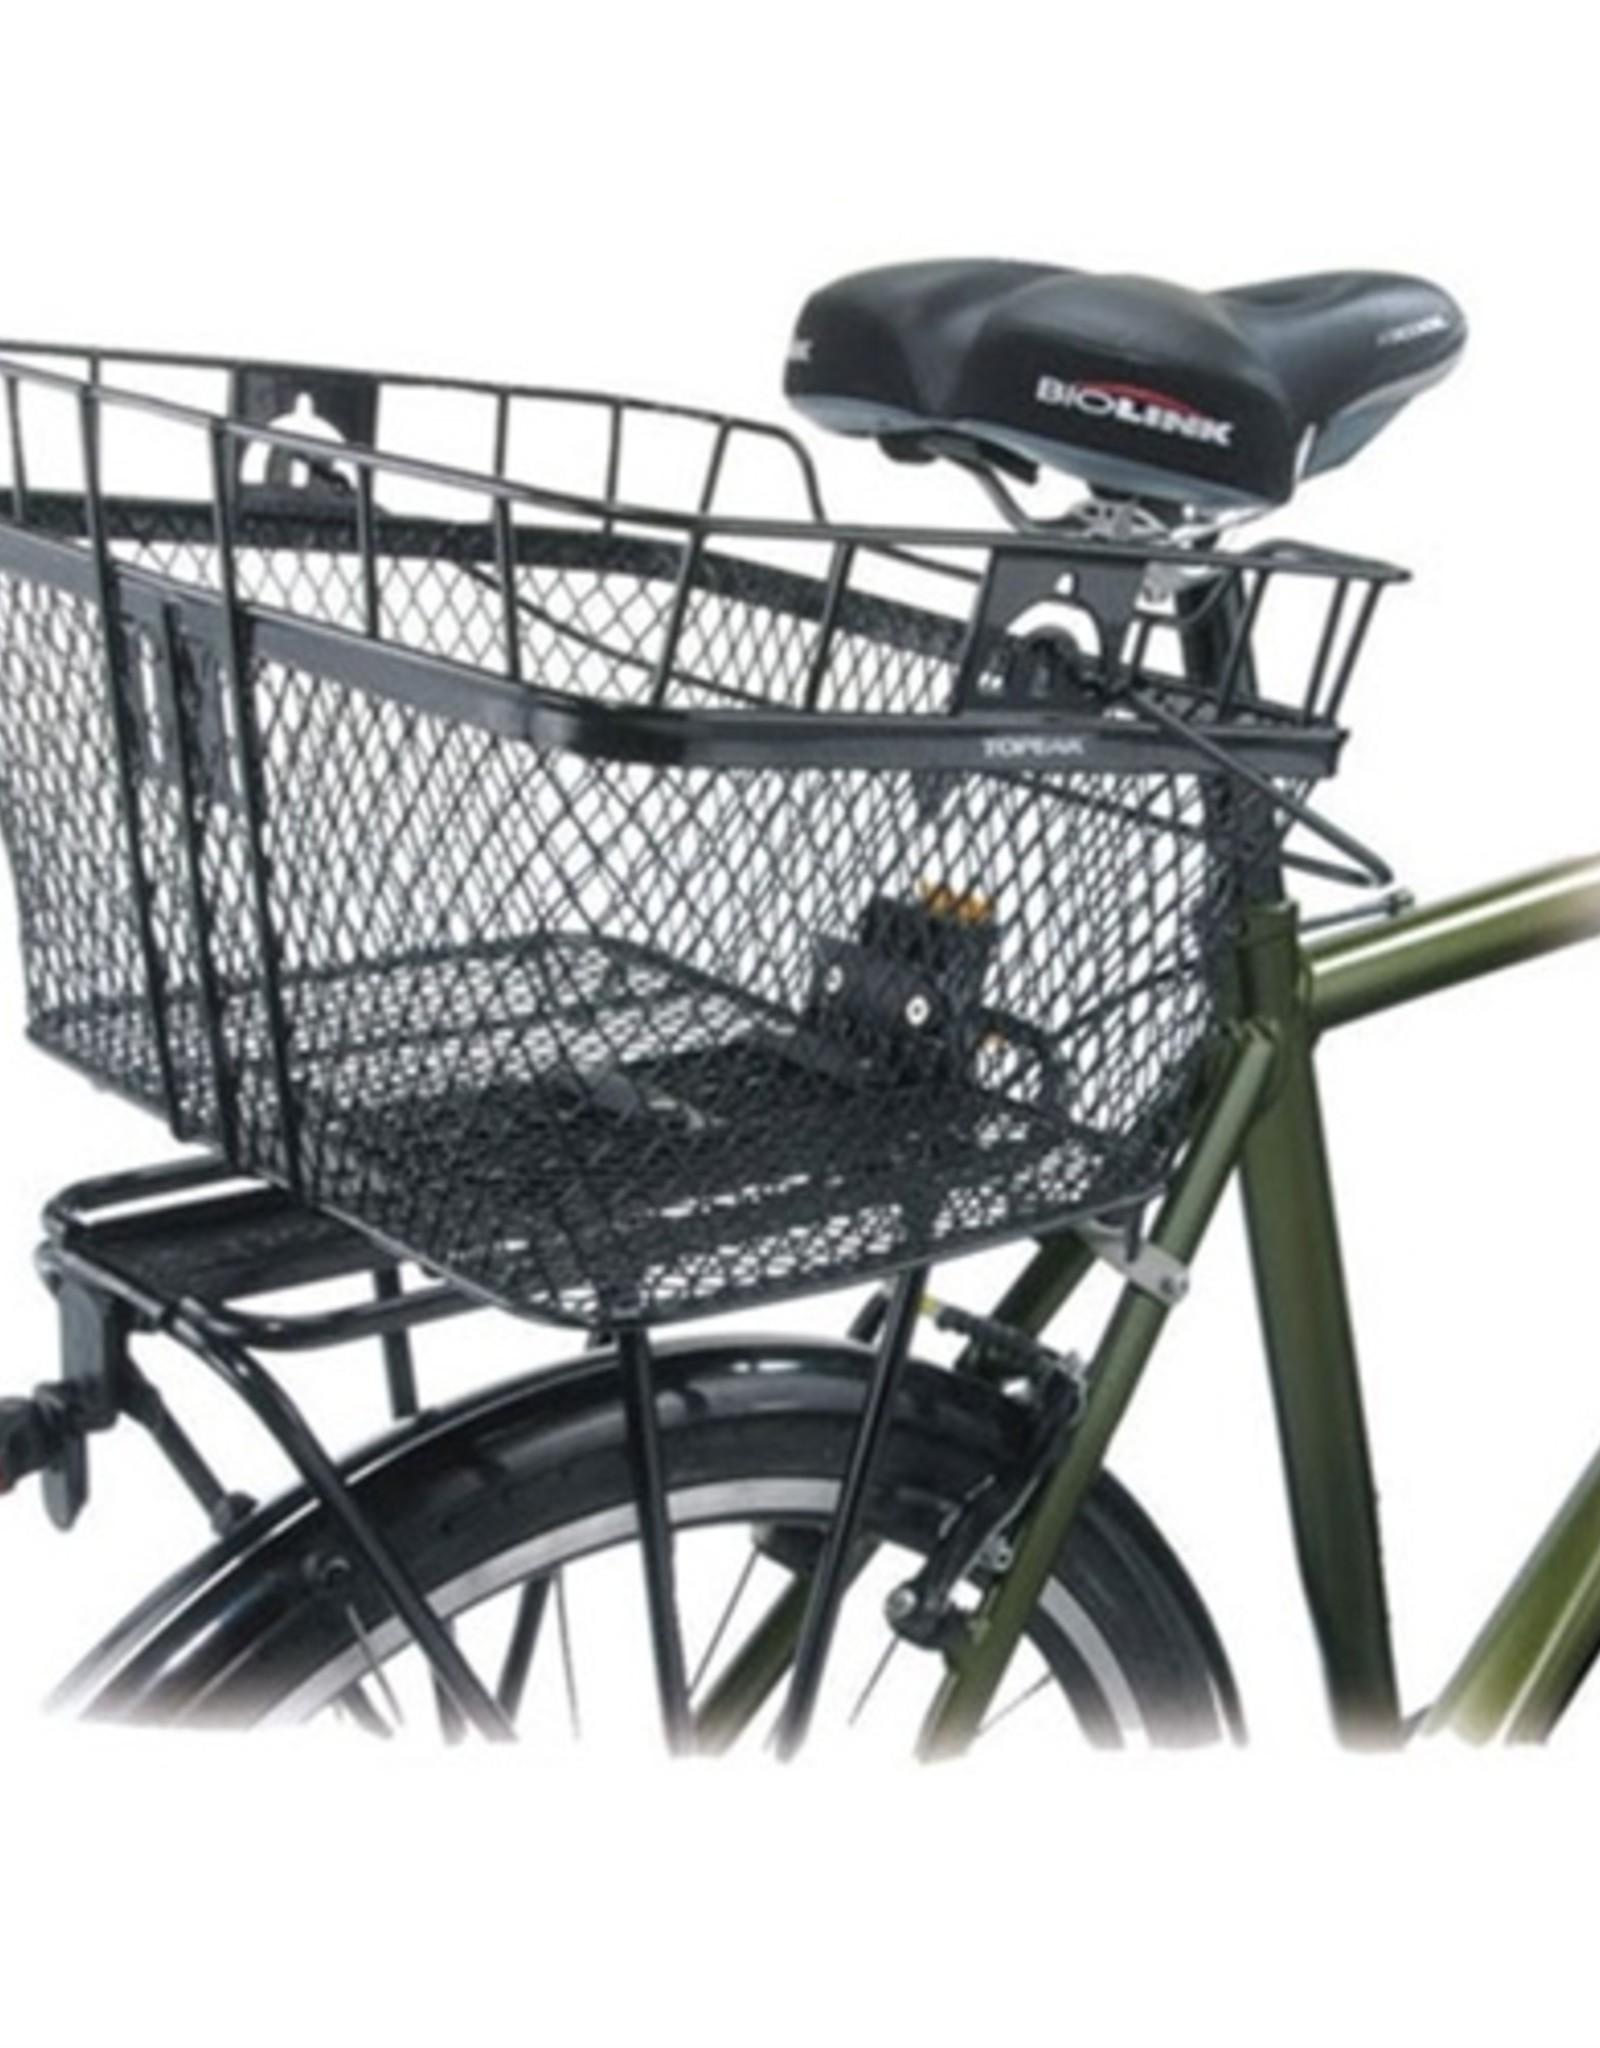 Basket - Topeak MTX Rear Black